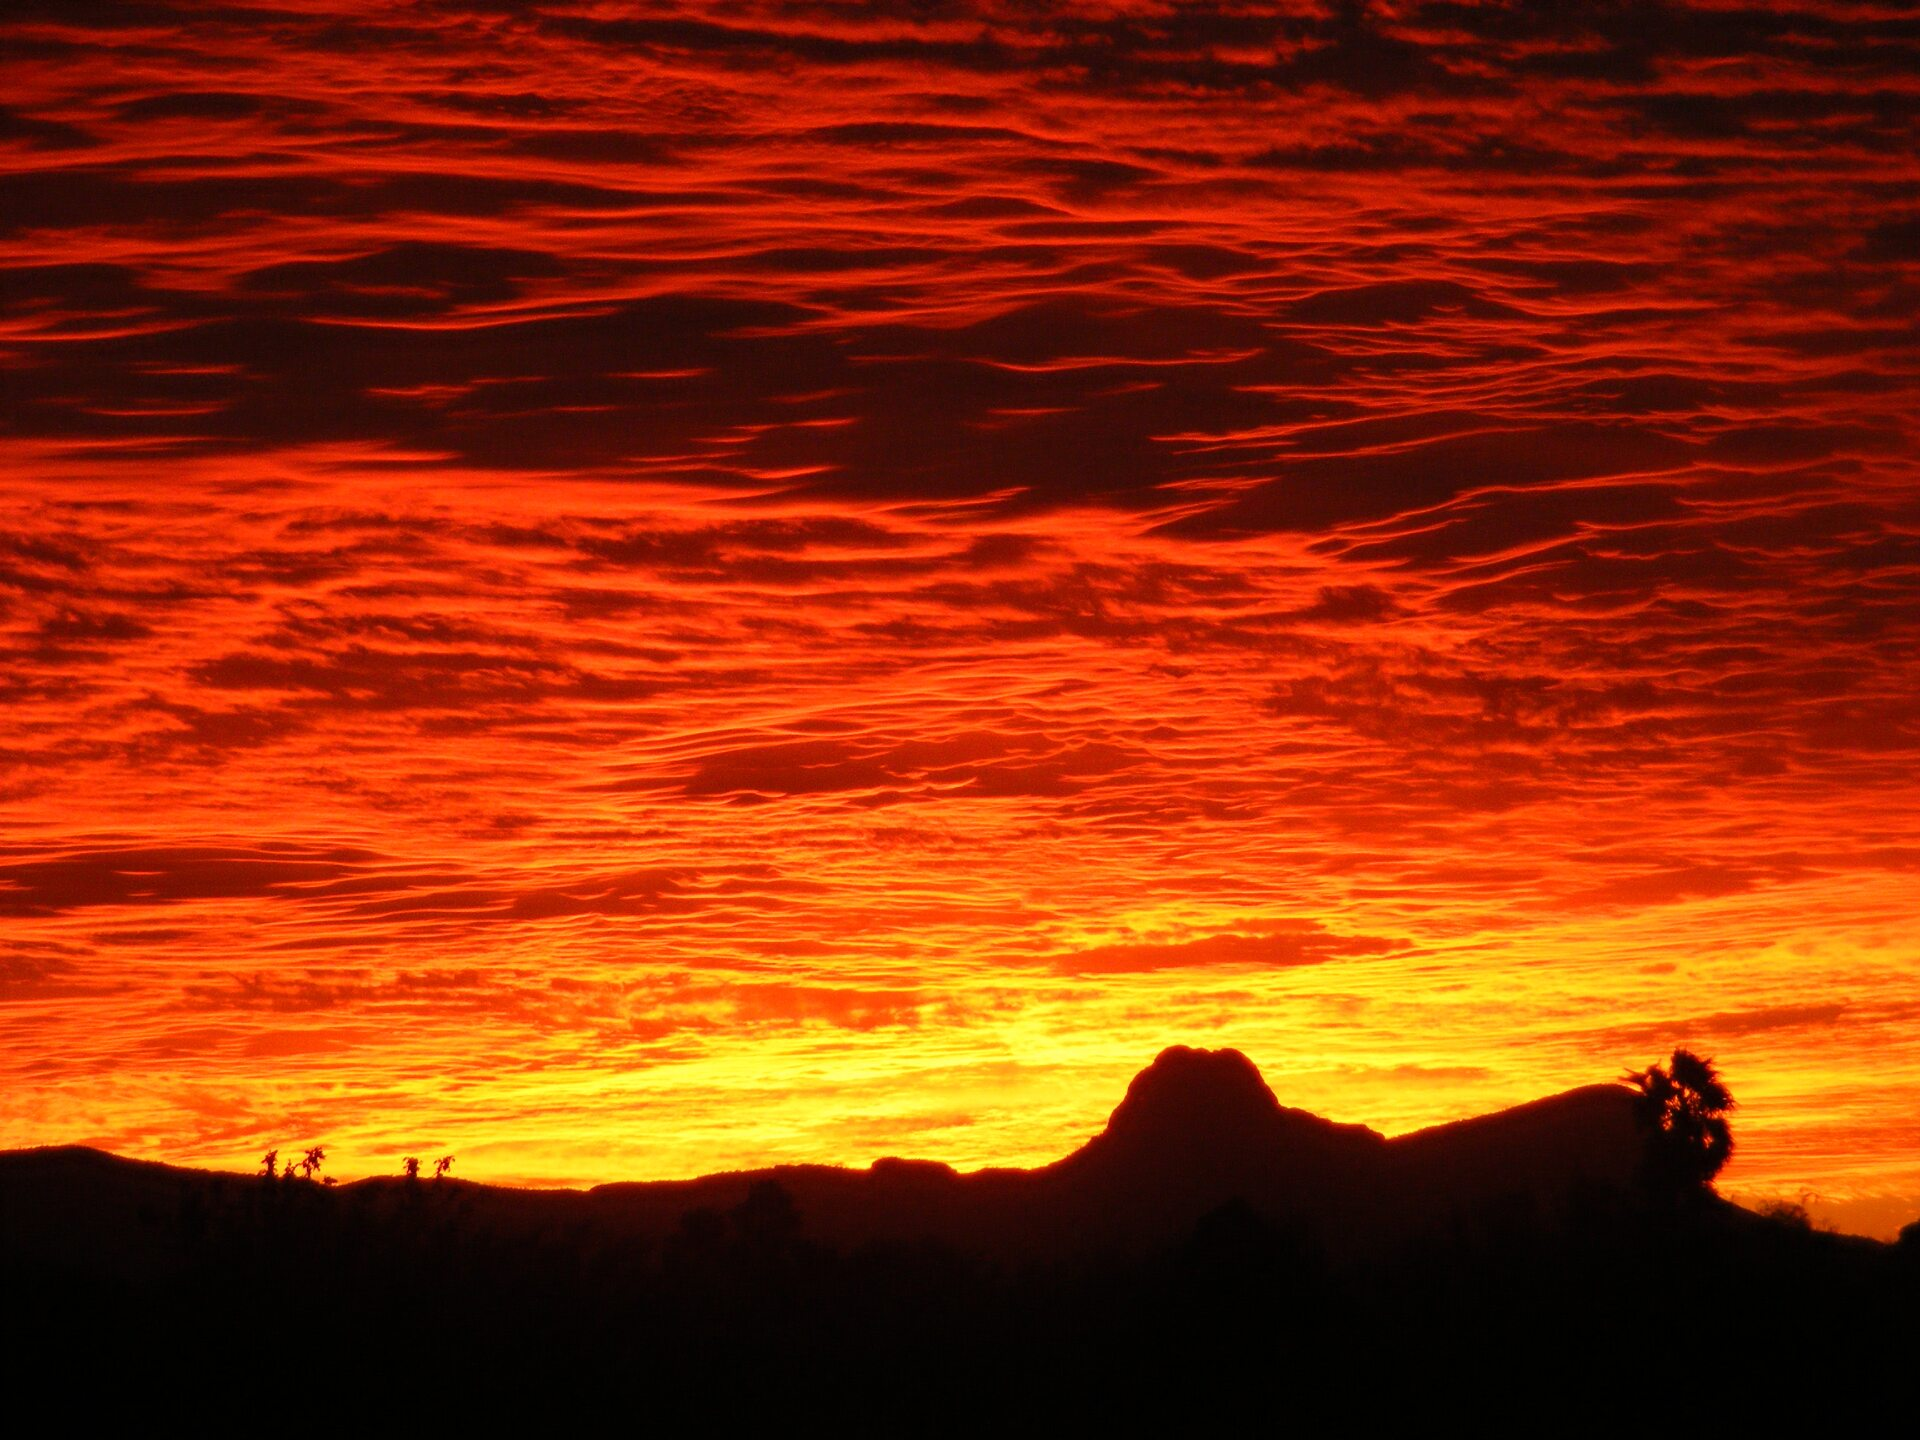 SUNSET- william.schoenfeld sunset from Shannon Rd. and Linda Vista.JPG